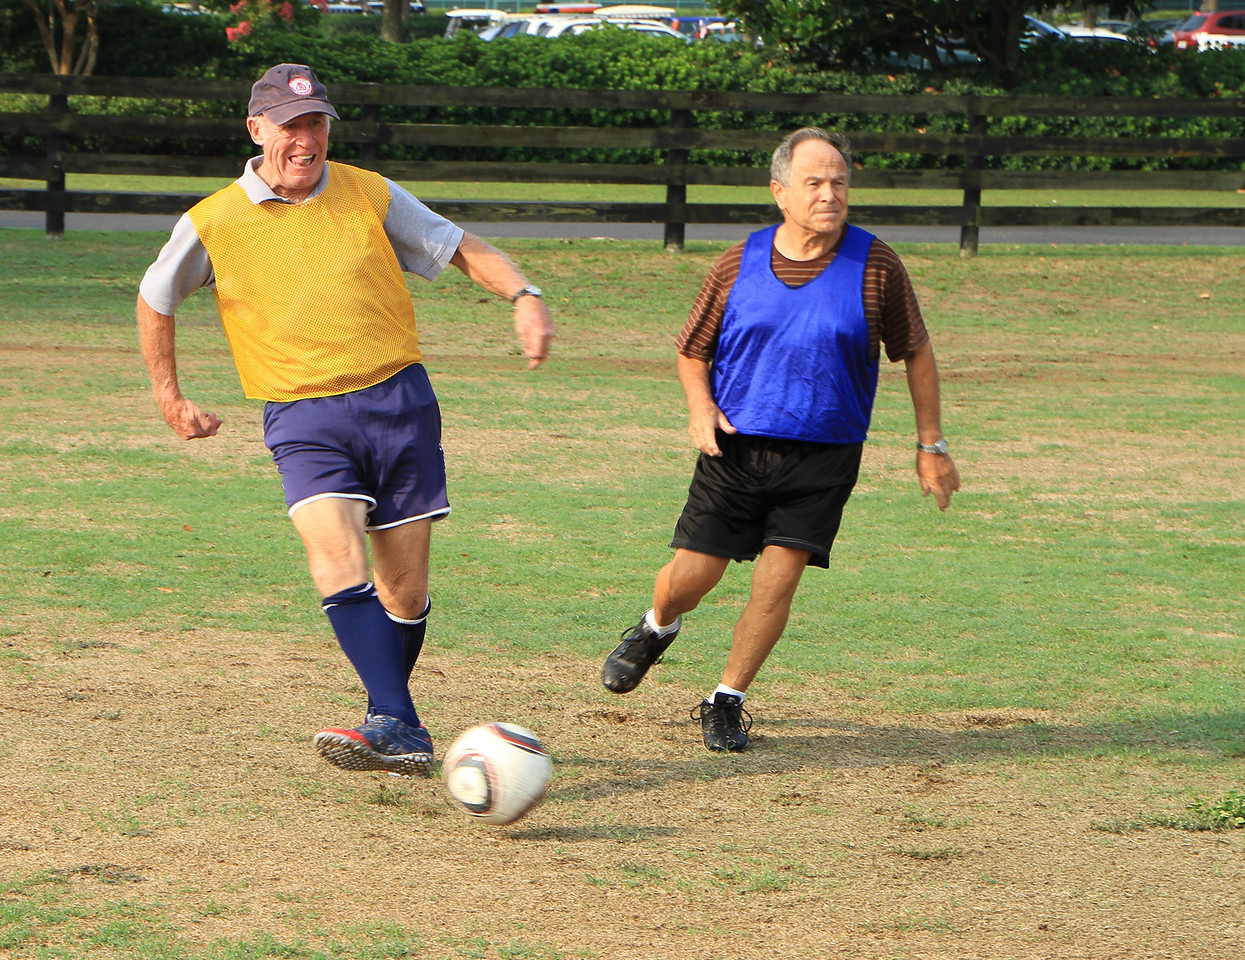 John Ellis in the yellow giving a kick!